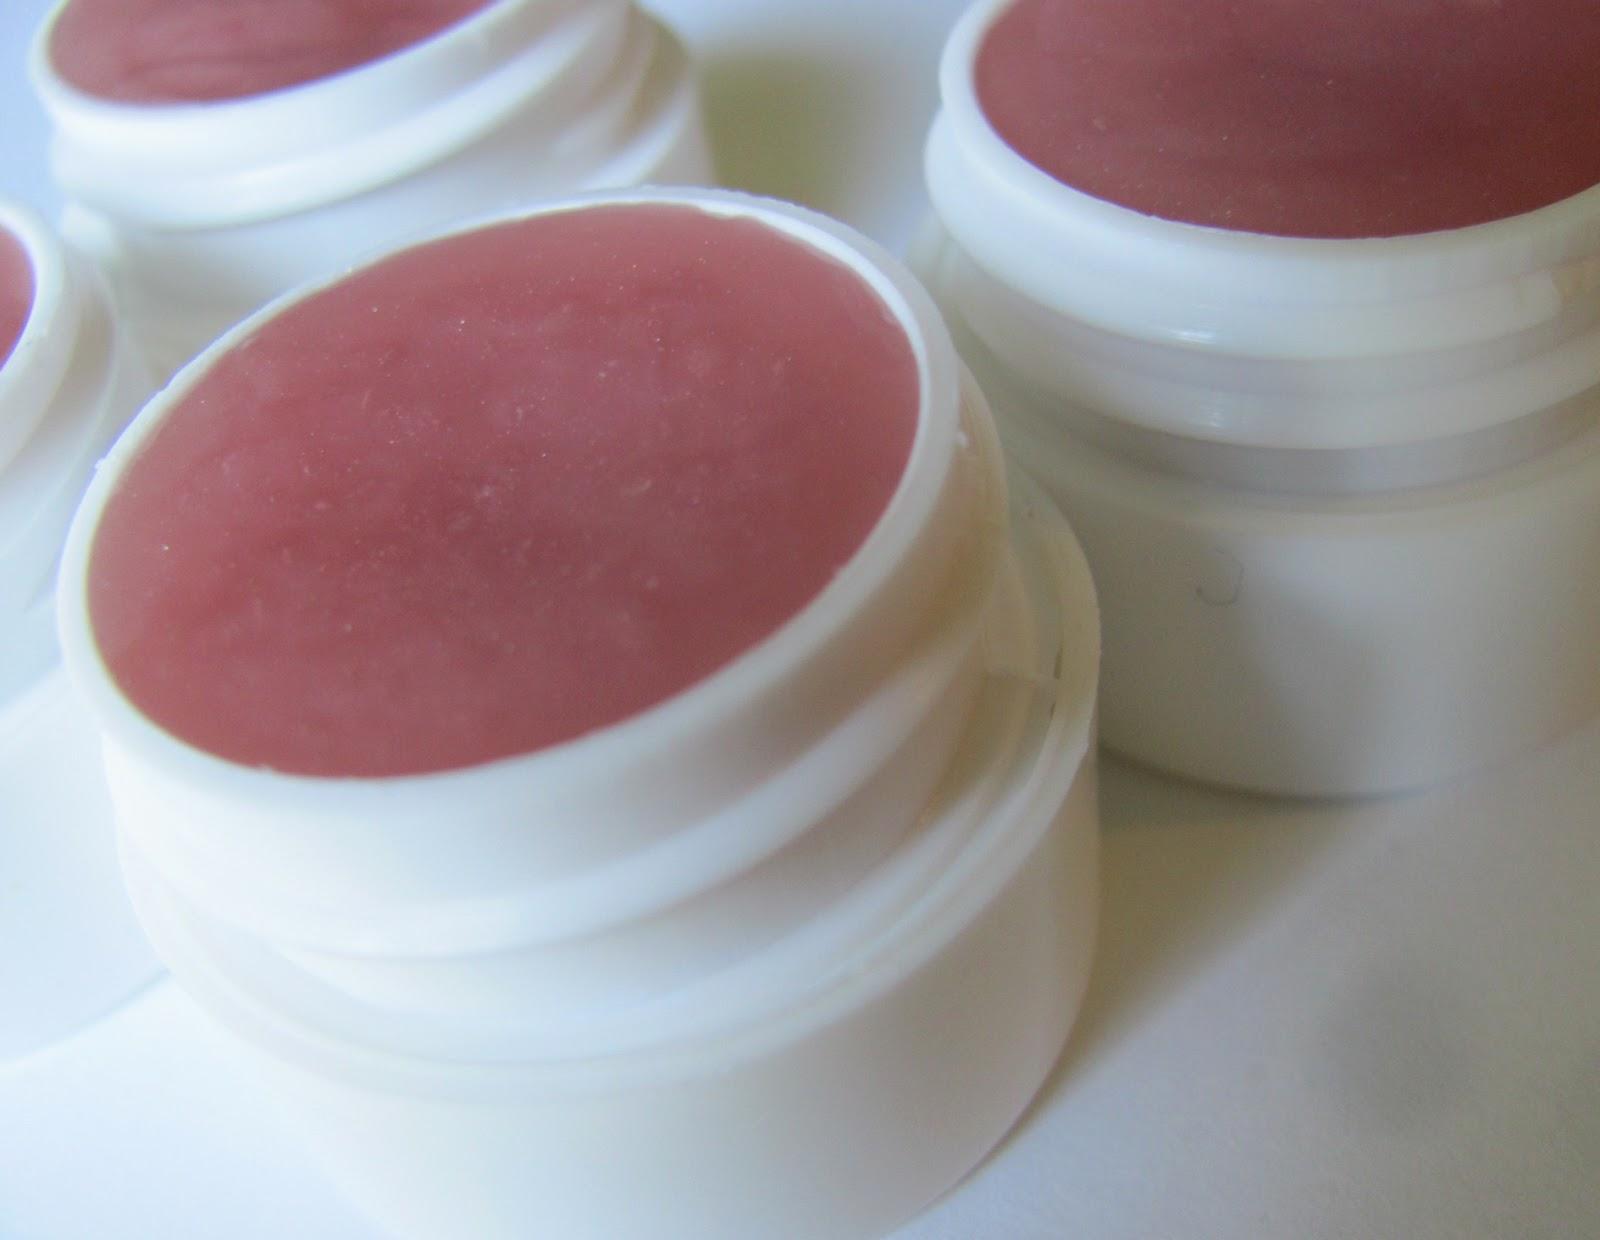 DIY Lip Balm - homemade lipbalm - simple to make! #diy #homemade #